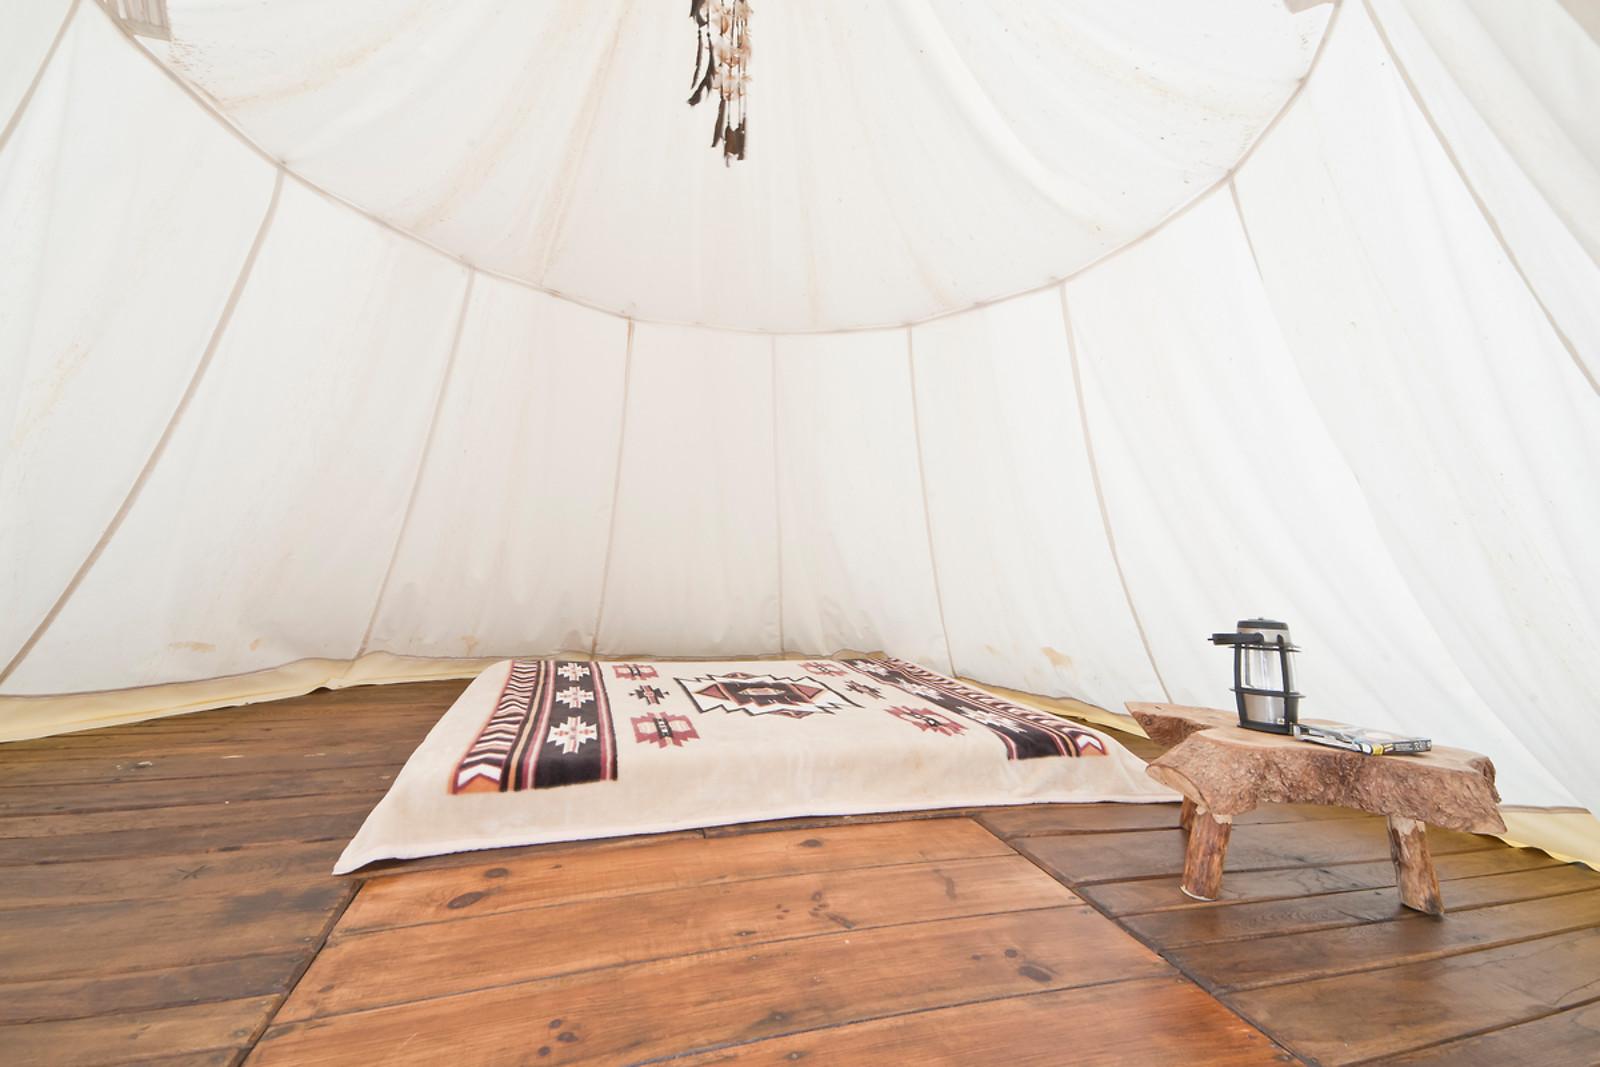 nuit pour 2 en tipi du far west savignac ledrier 24 wonderbox. Black Bedroom Furniture Sets. Home Design Ideas